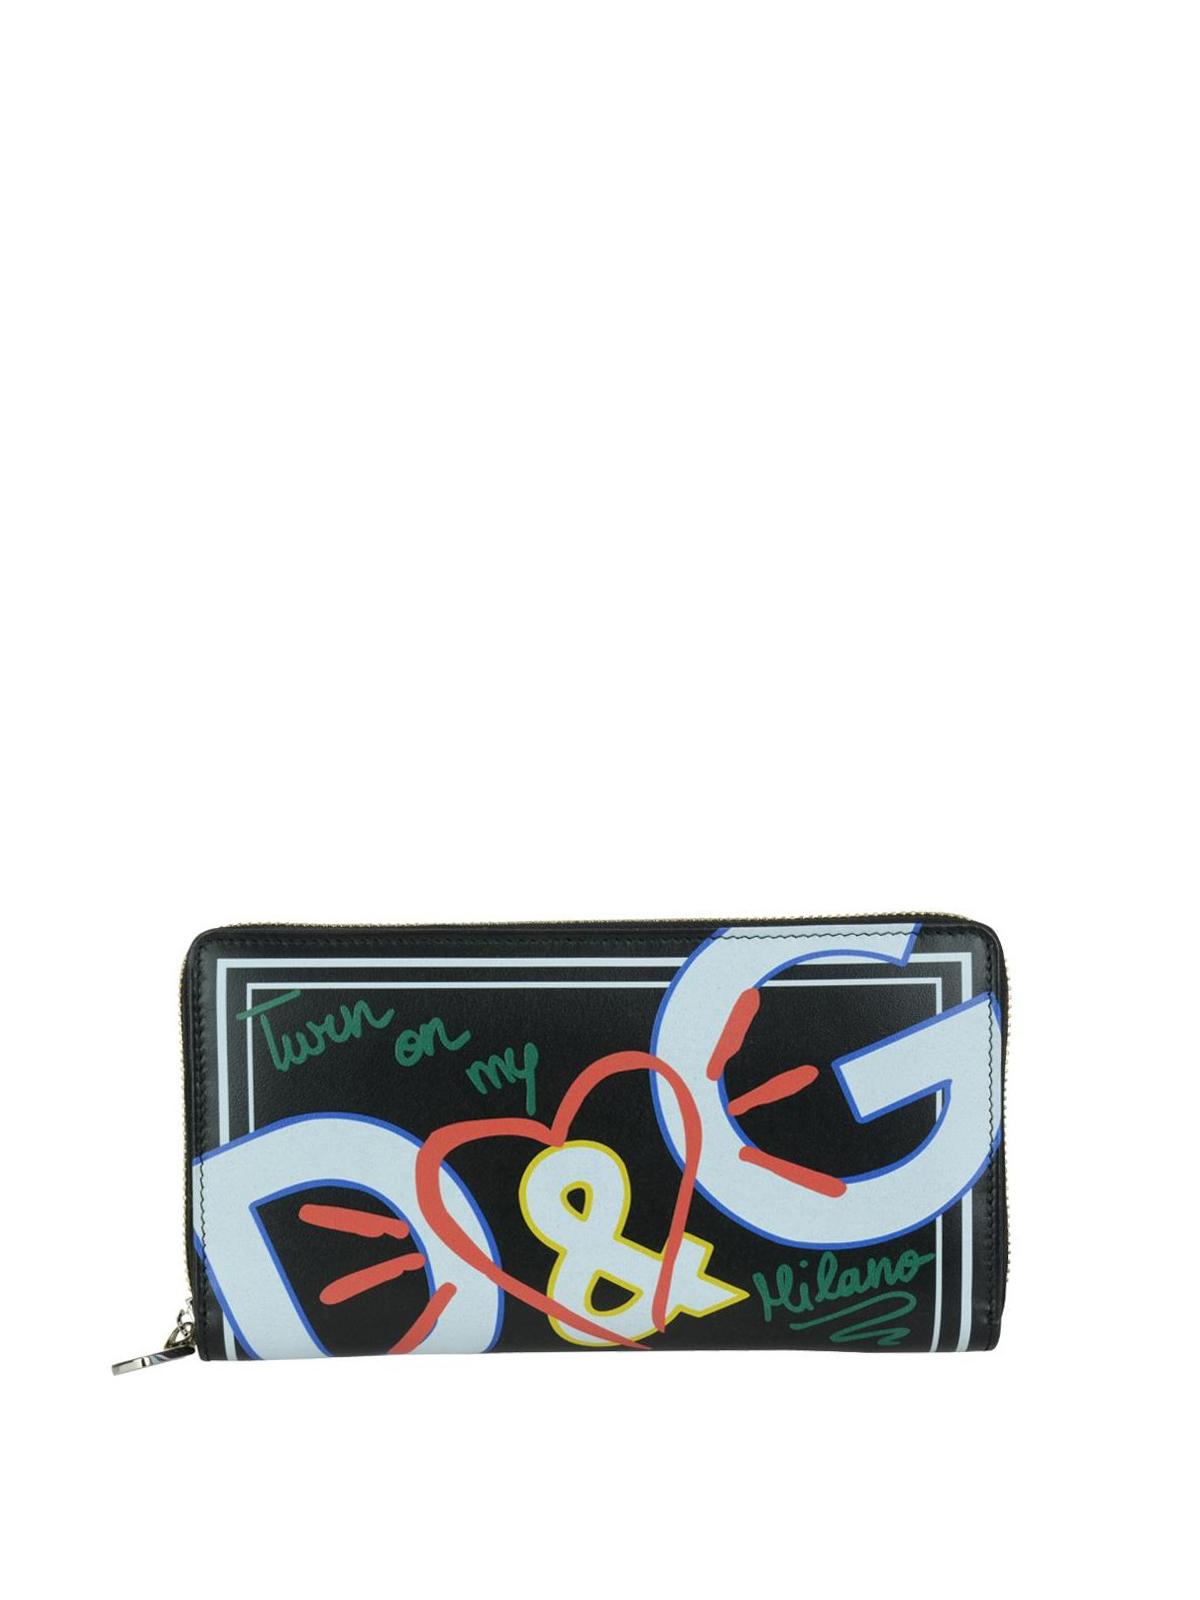 Black Graffiti Print Zip Around Wallet Dolce & Gabbana RHyQyUrLo